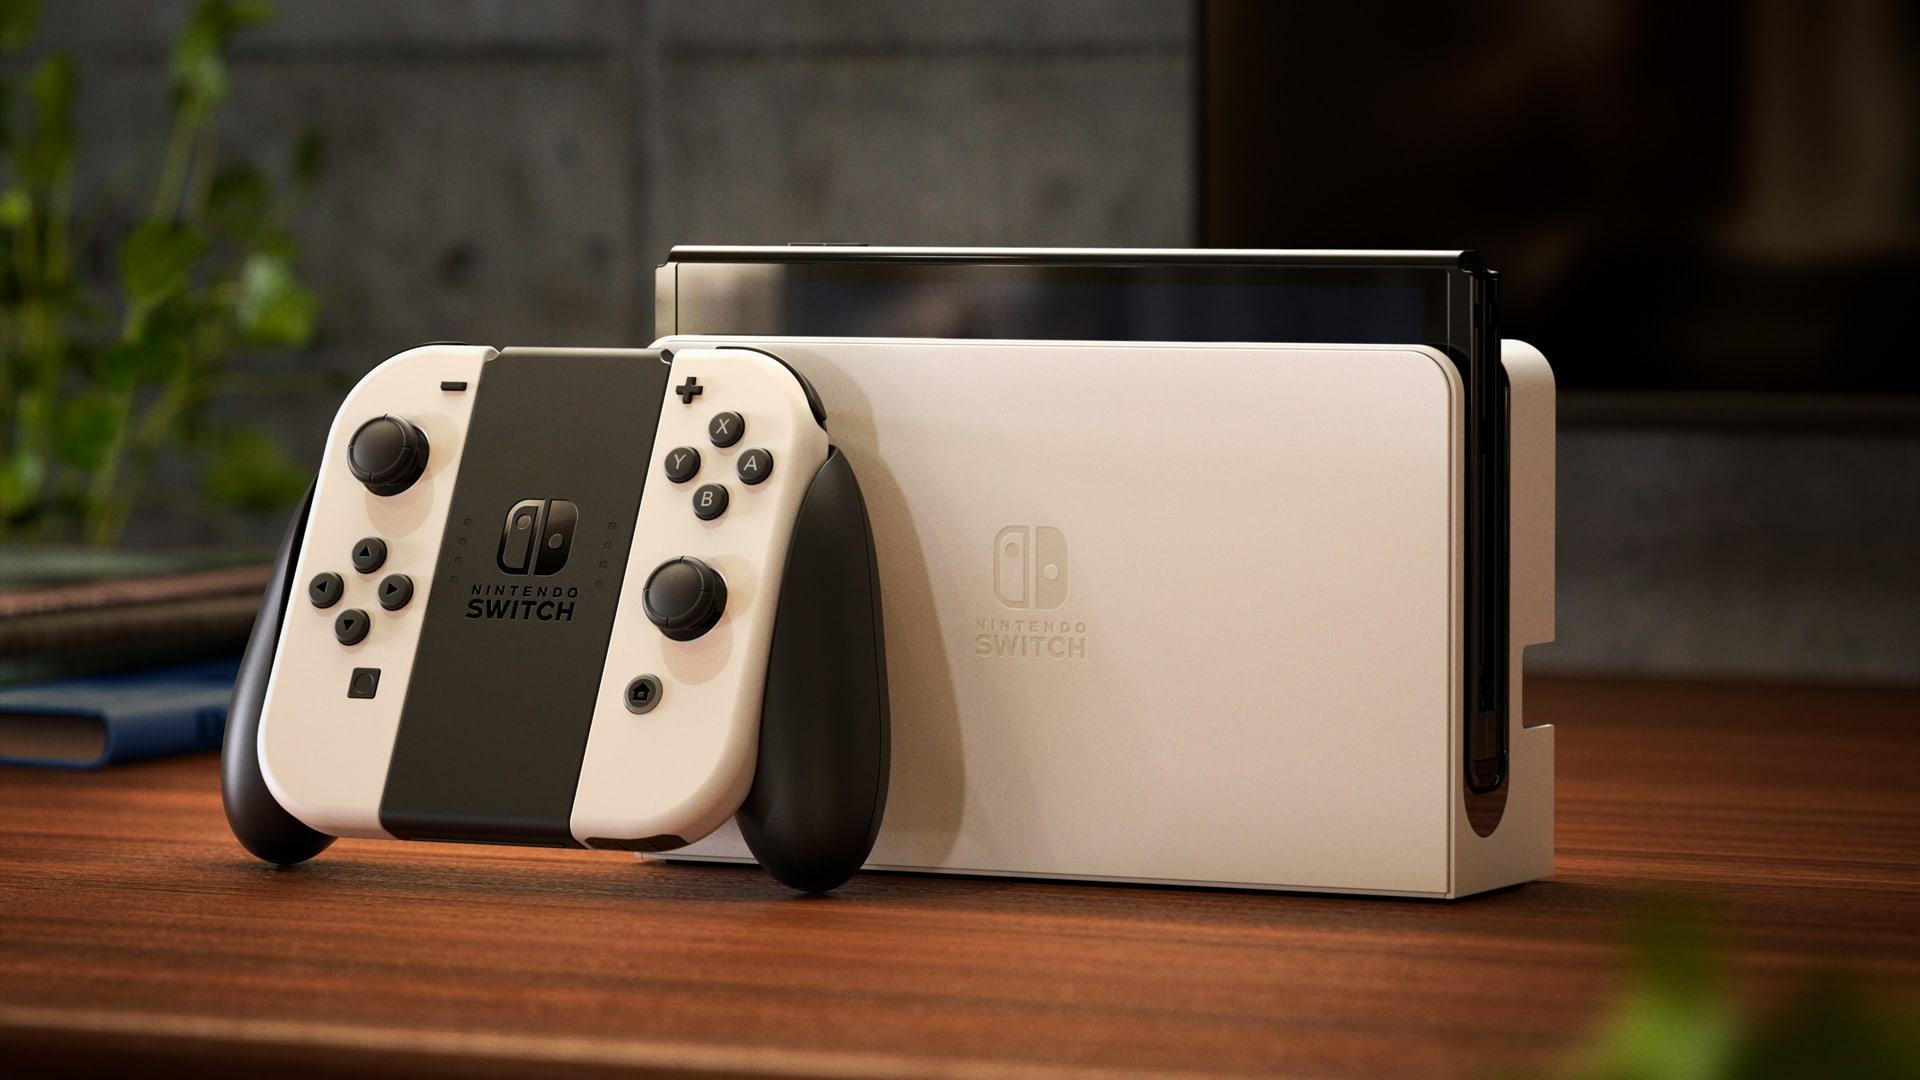 Nintendo reveals new Switch OLED model